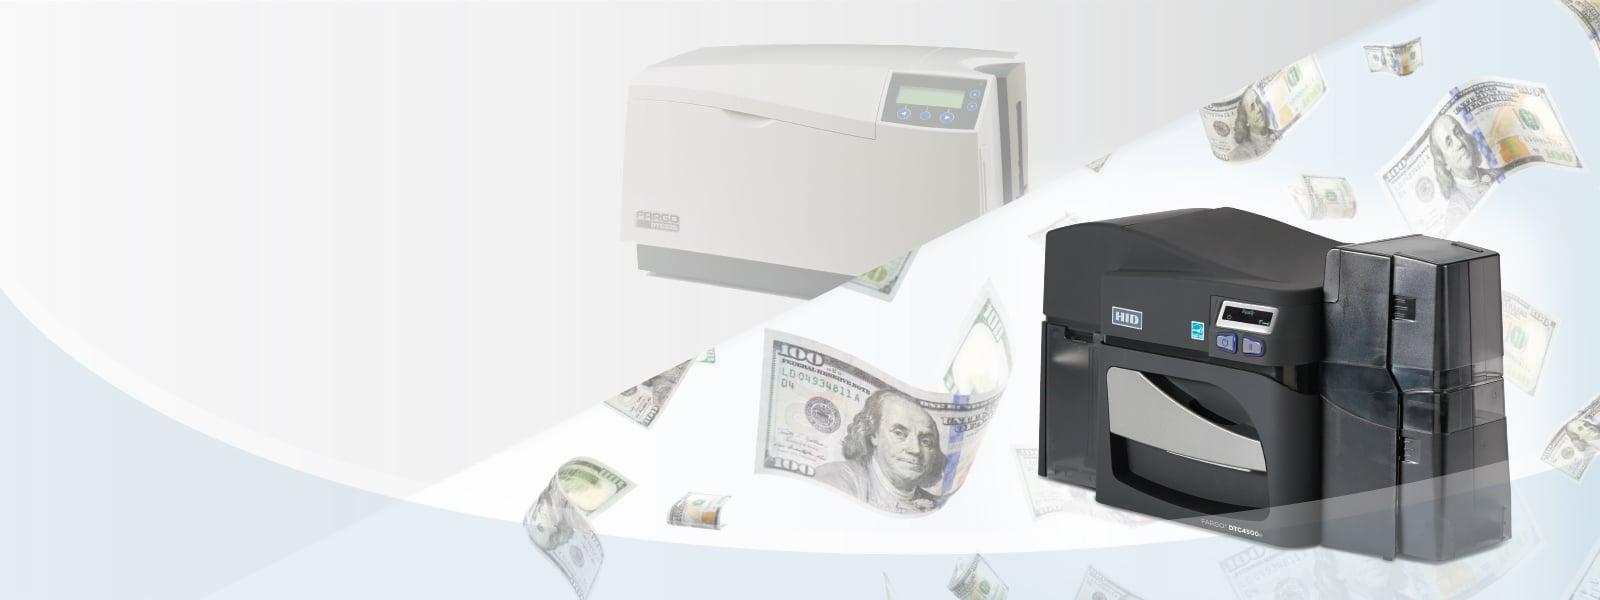 primary-home-banner-printer-tradein